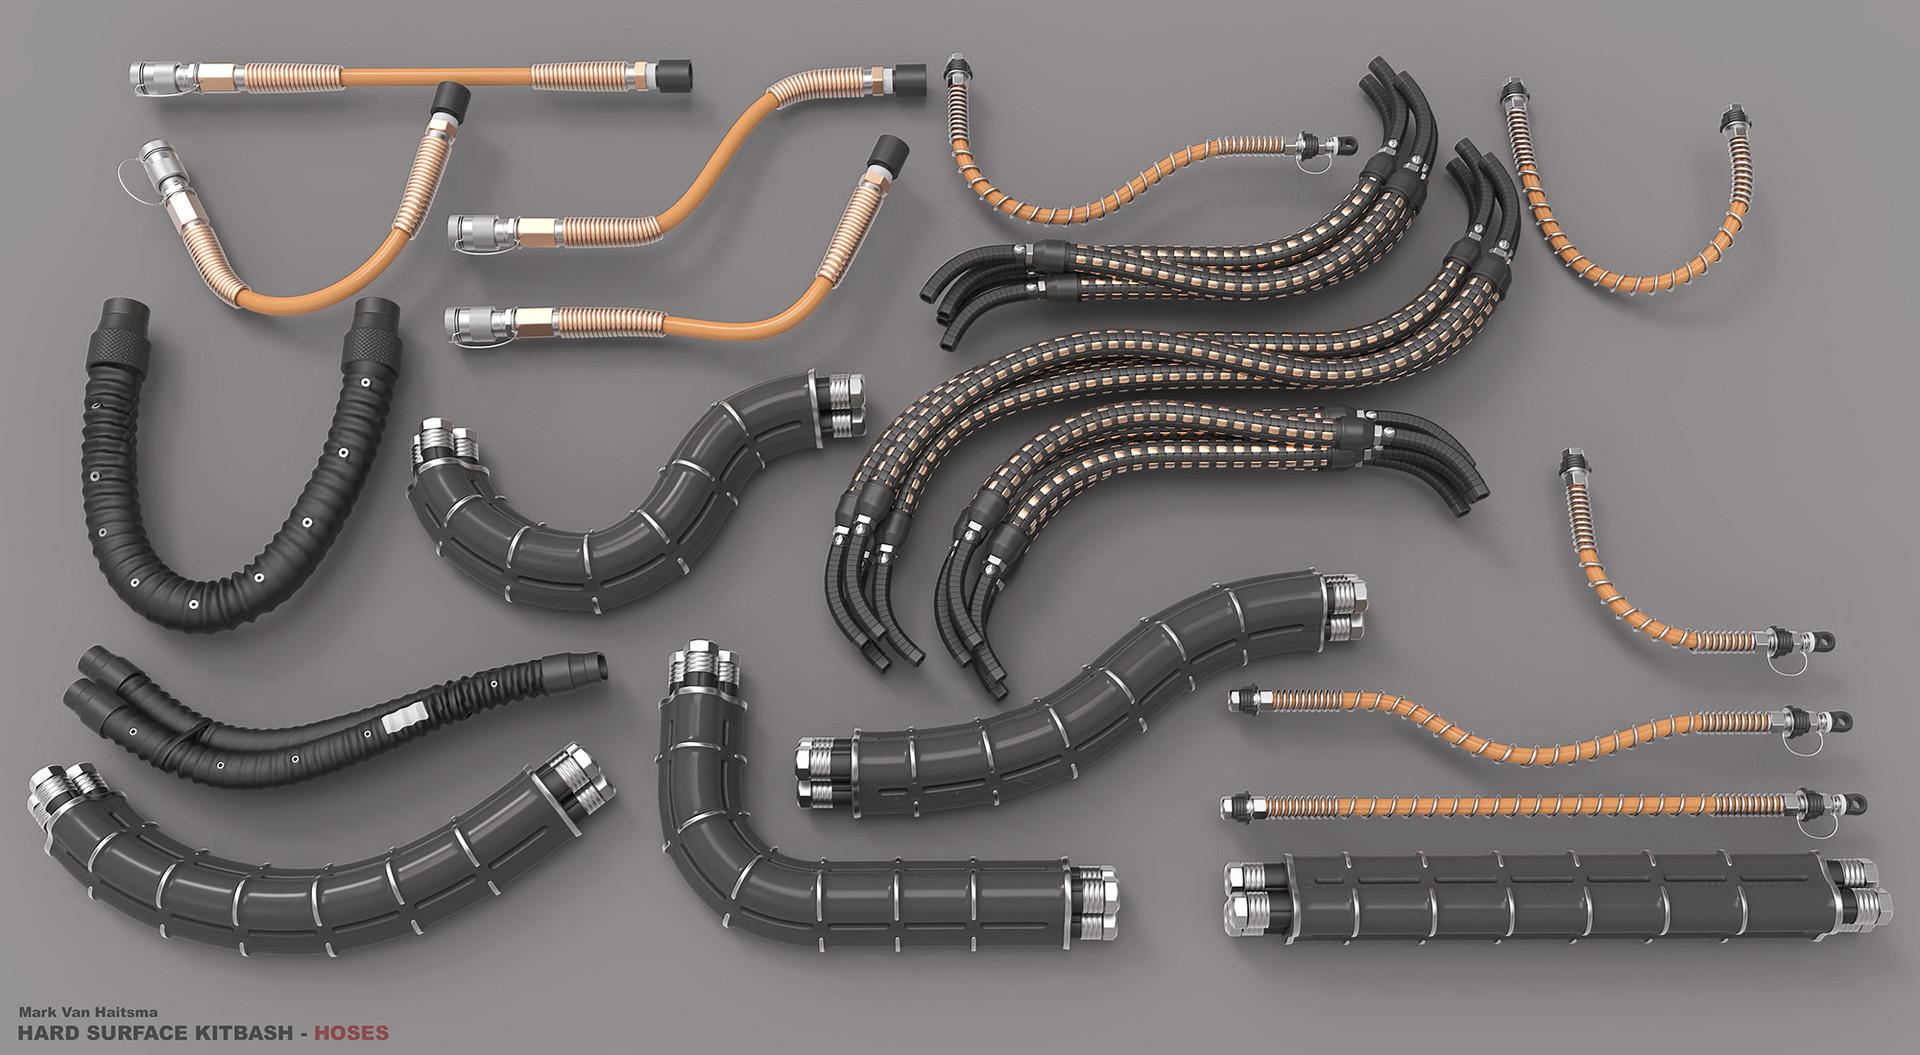 Mark van haitsma hoses collage 02 sm